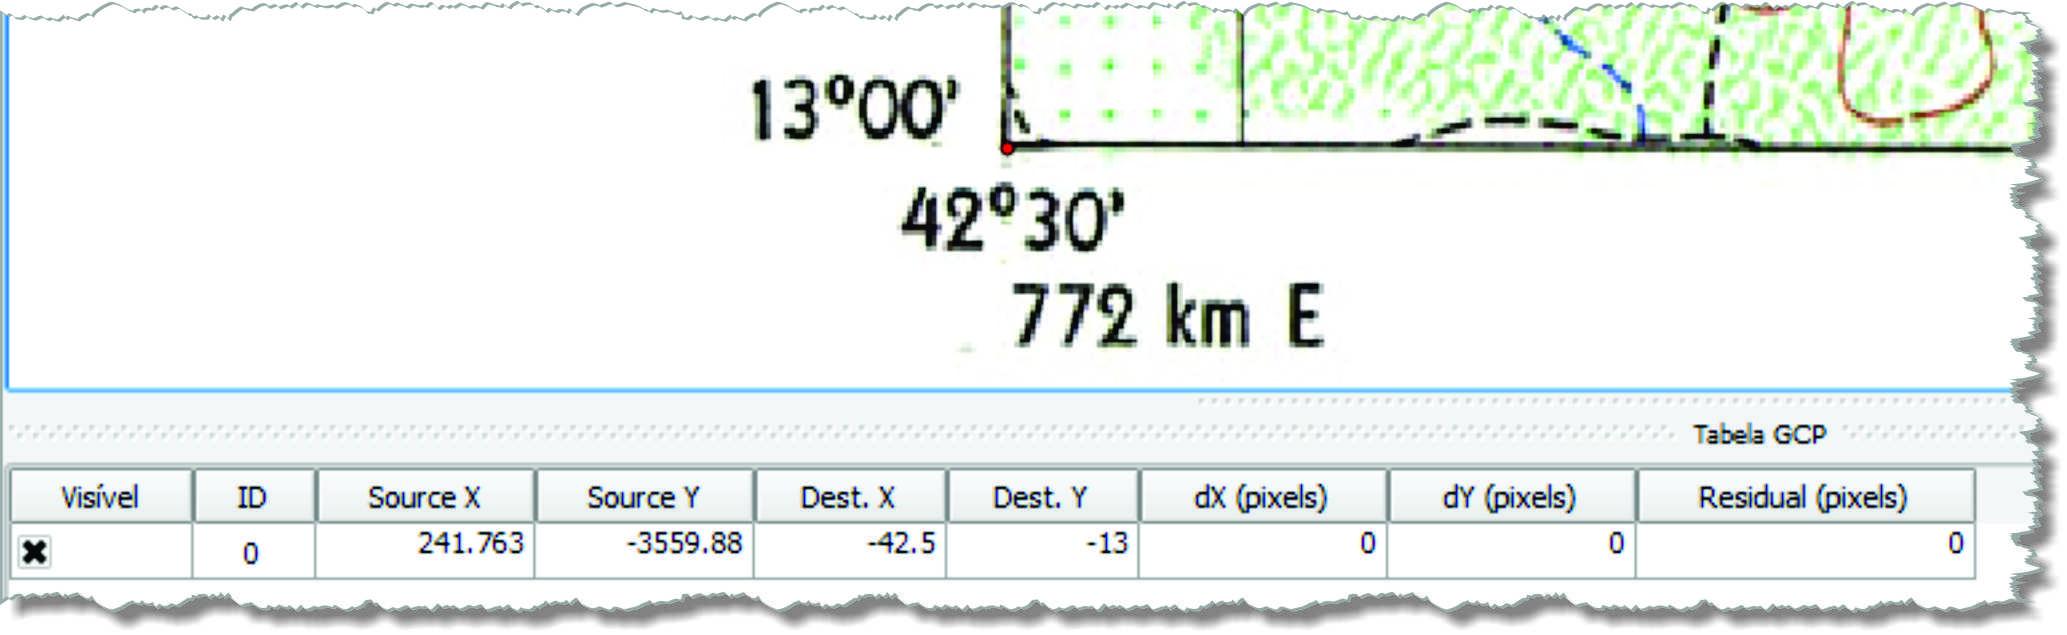 insercao e tabela Decifrando o georreferenciamento de carta topográfica no QGIS